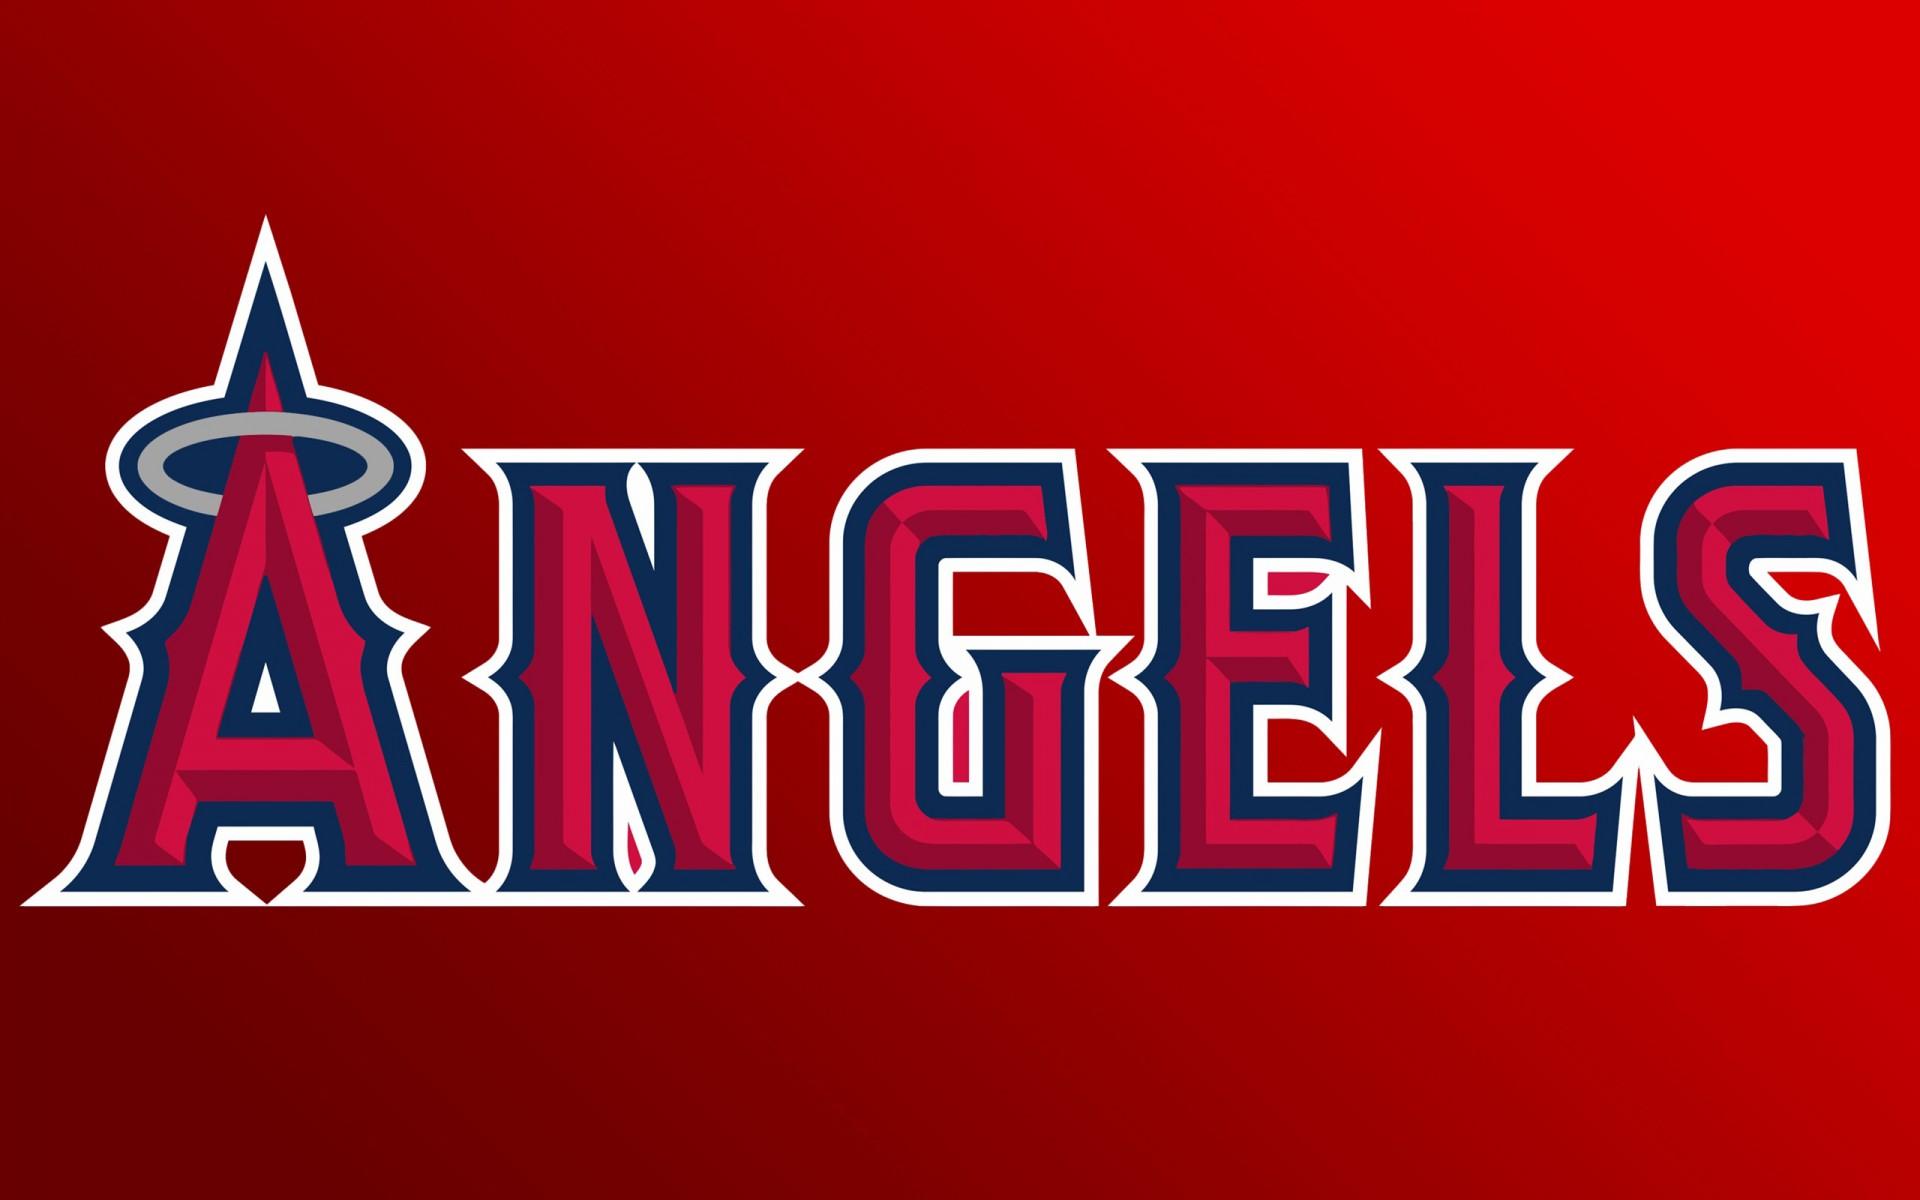 ANAHEIM ANGELS baseball mlb s wallpaper 1920x1200 158476 1920x1200